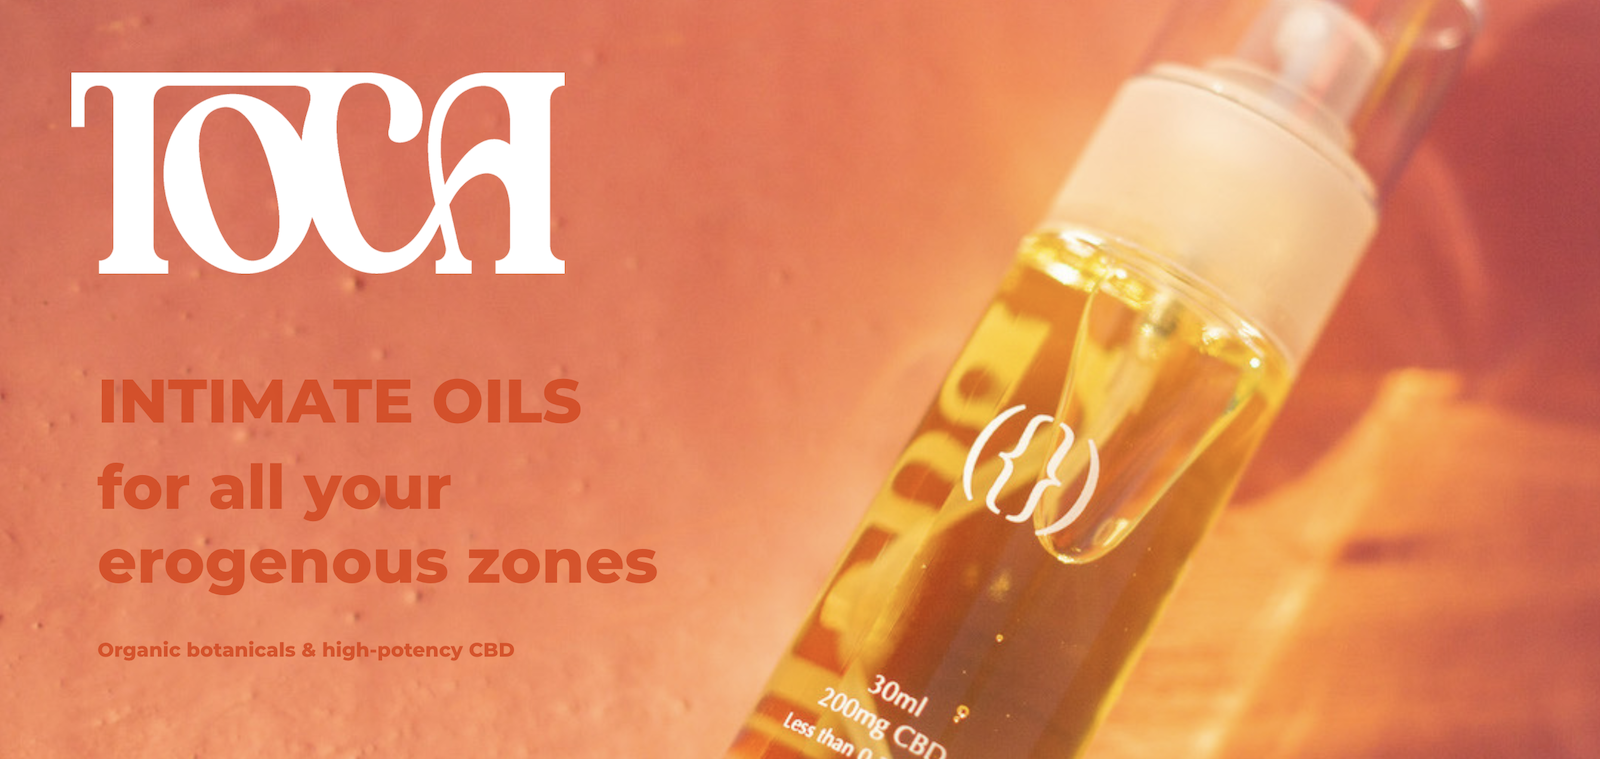 TOCA CBD intimate oils